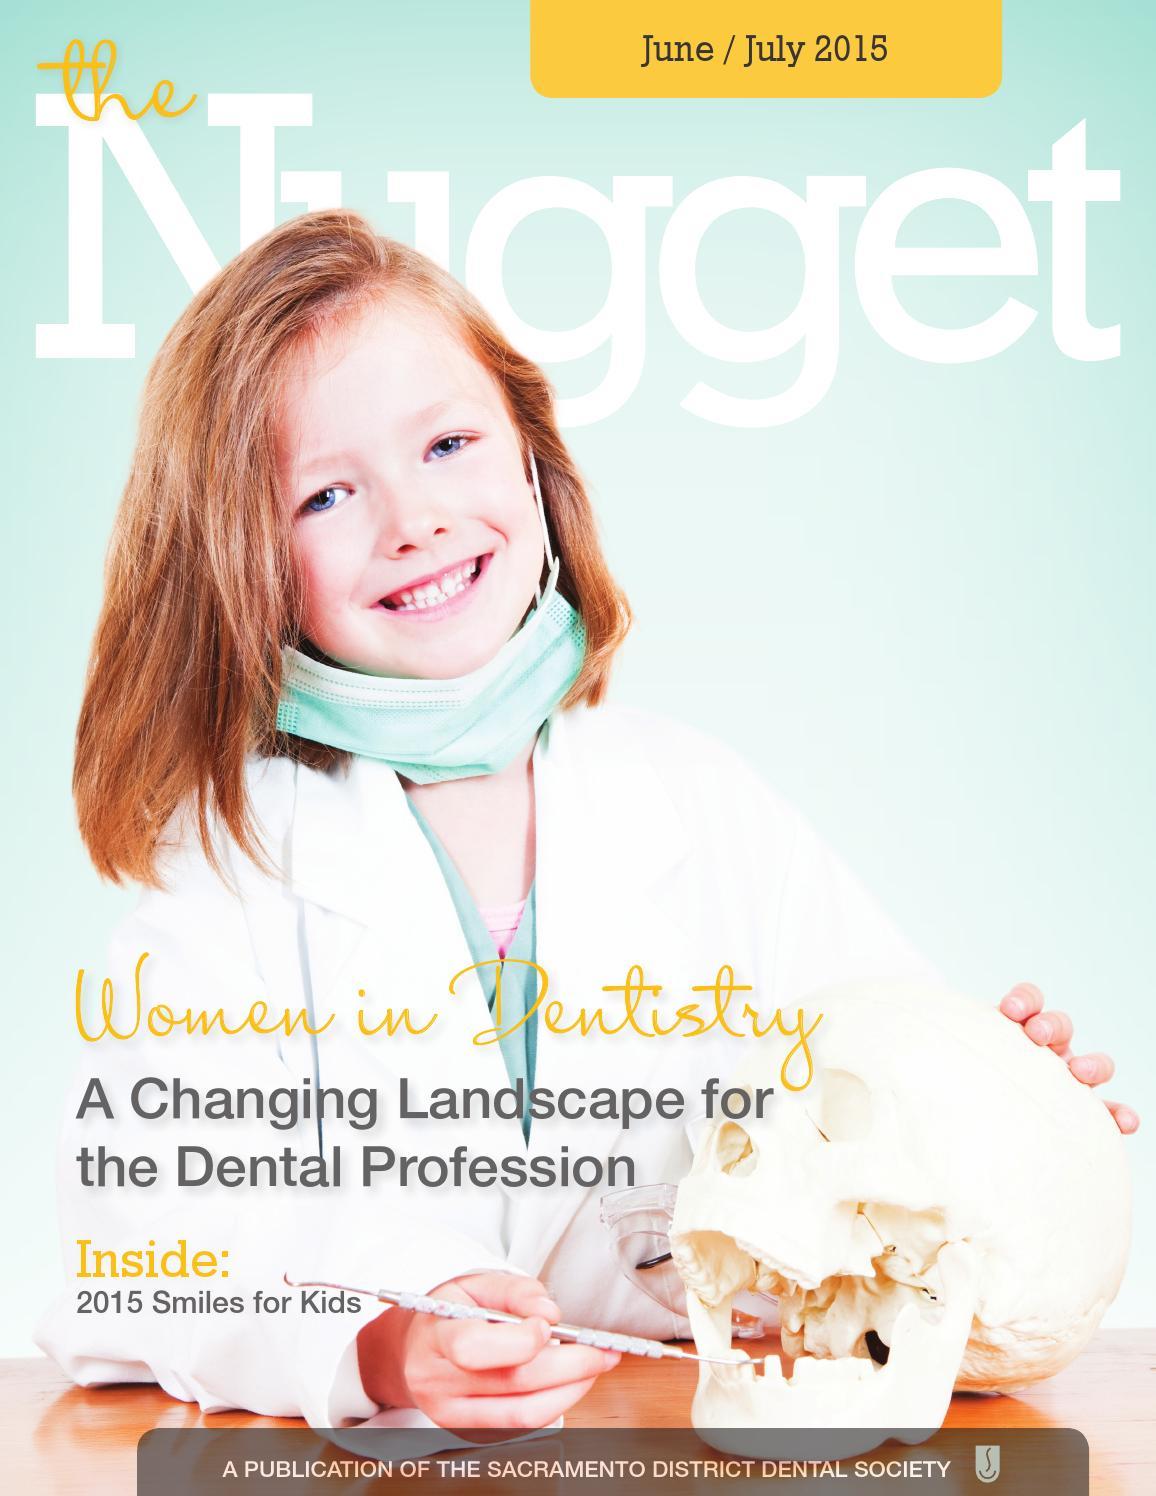 2014 nugget by sacramento district dental society 2014 nugget by sacramento district dental society sdds issuu